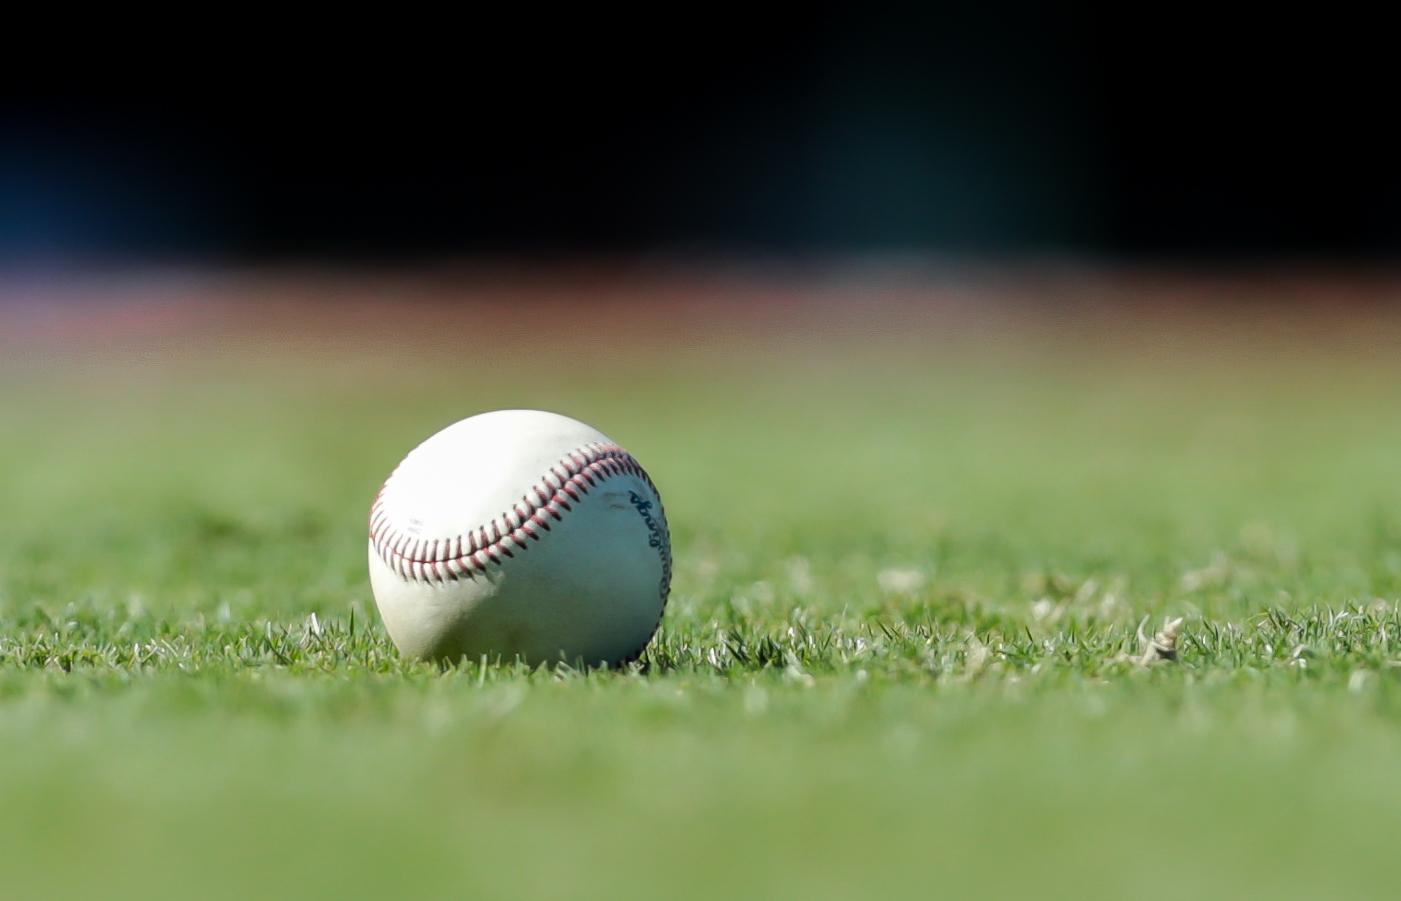 MiLB: OCT 19 Arizona Fall League